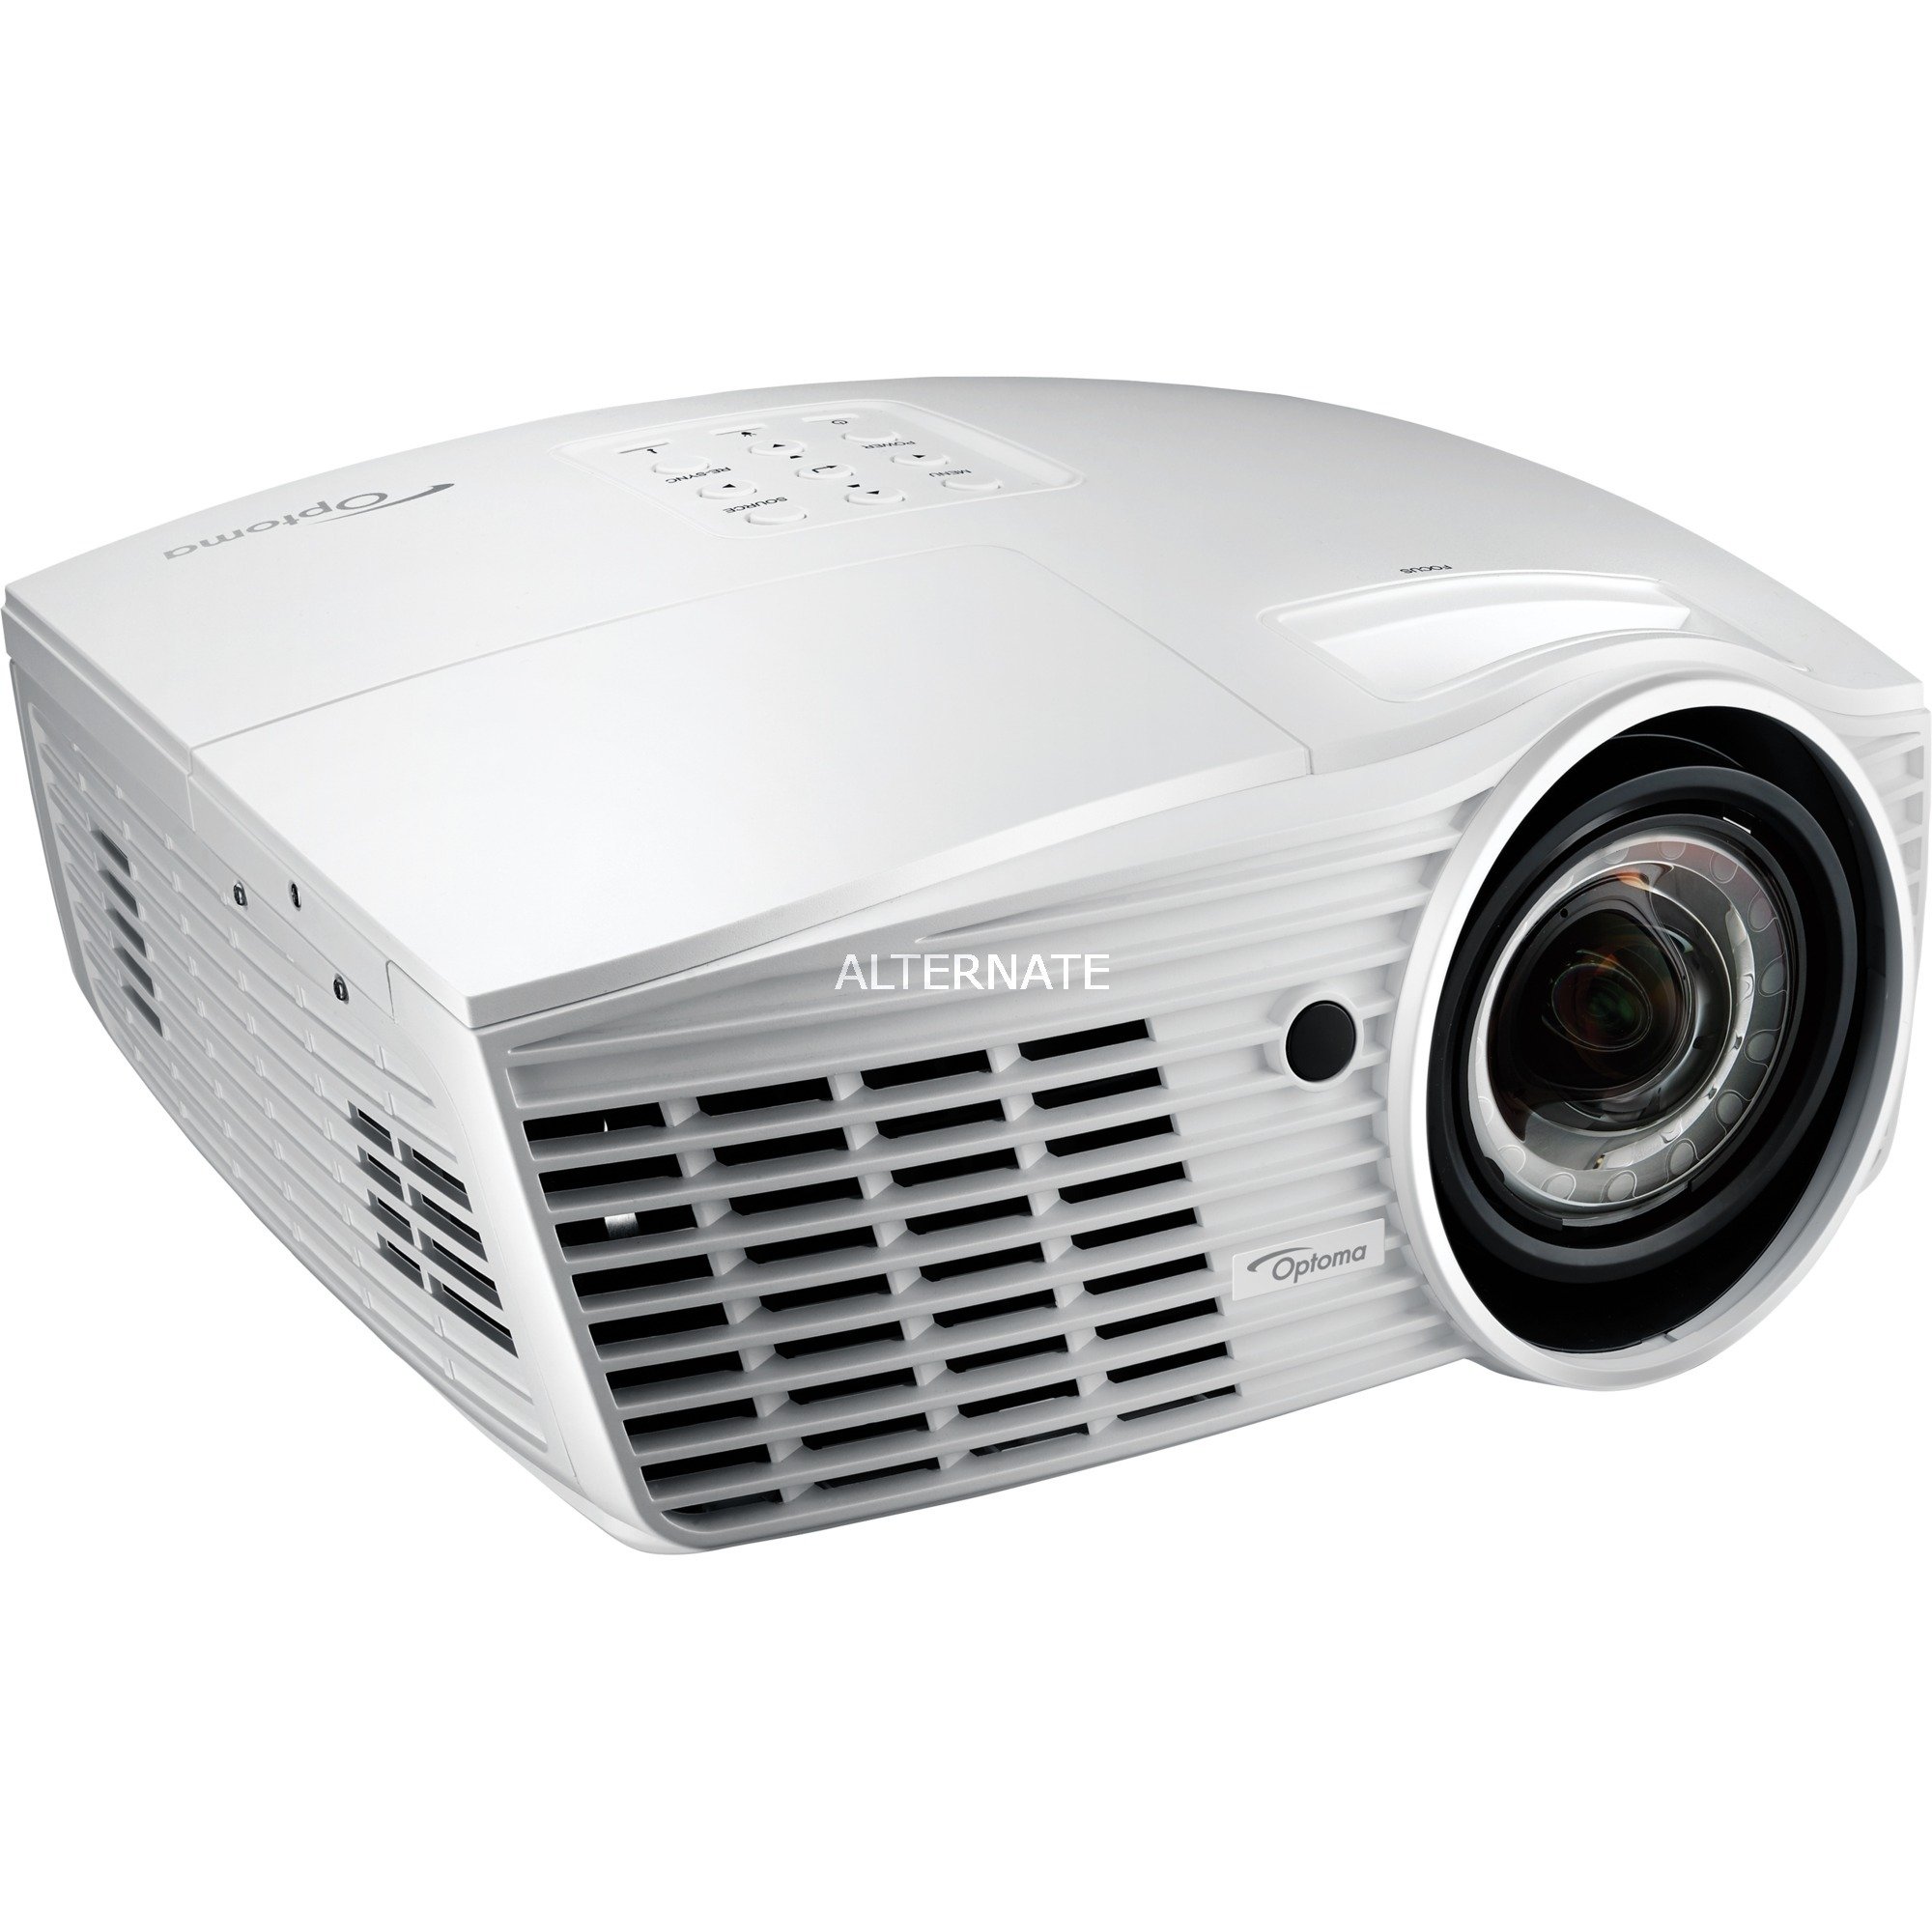 EH415ST Proyector para escritorio 3500lúmenes ANSI DLP 1080p (1920x1080) 3D Blanco videoproyector, Proyector DLP